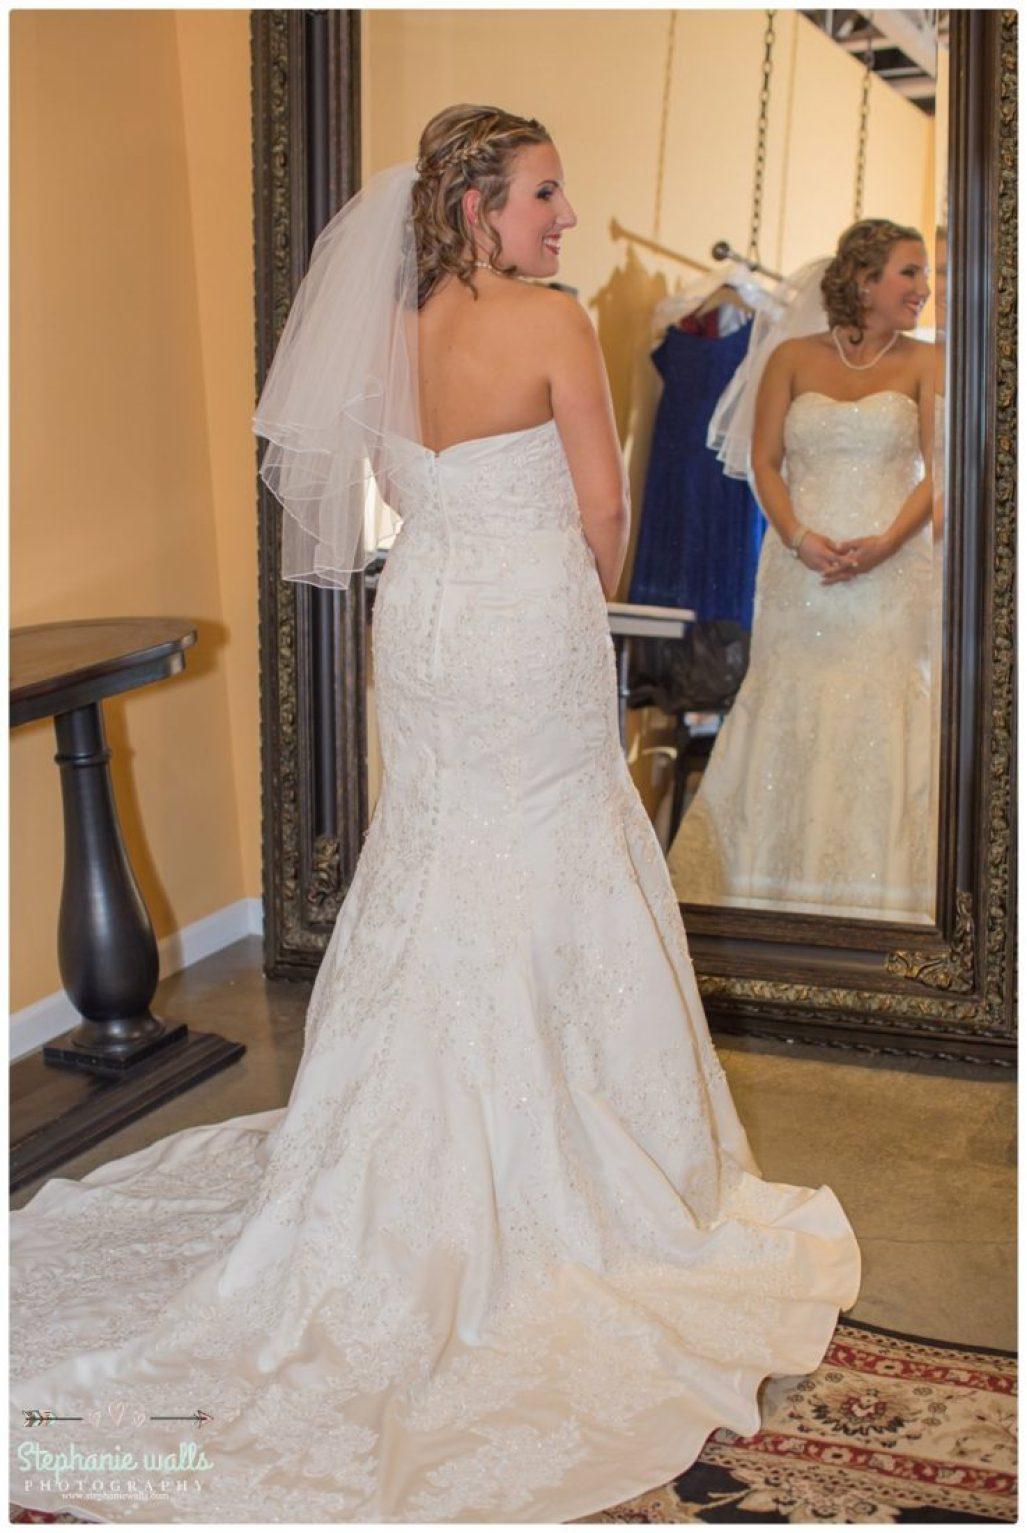 2016 03 24 0043 Racing Love   Snohomish Event Center   Snohomish Wedding Photographer